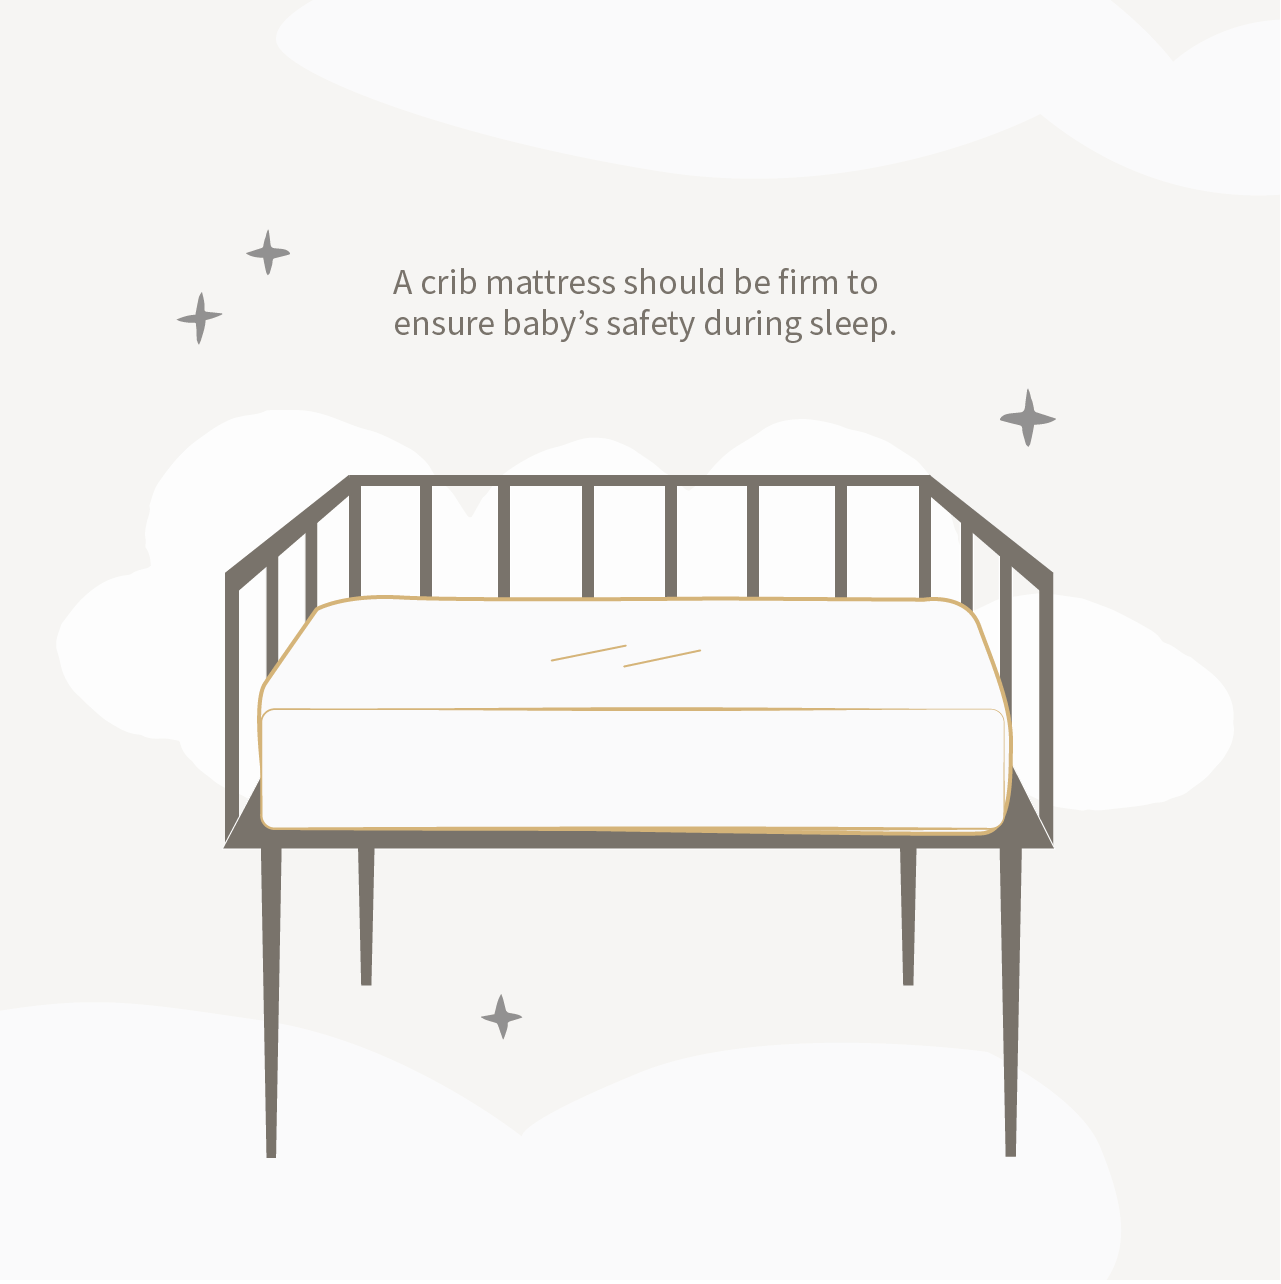 illustration of crib mattress in crib showing importance of mattress firmness